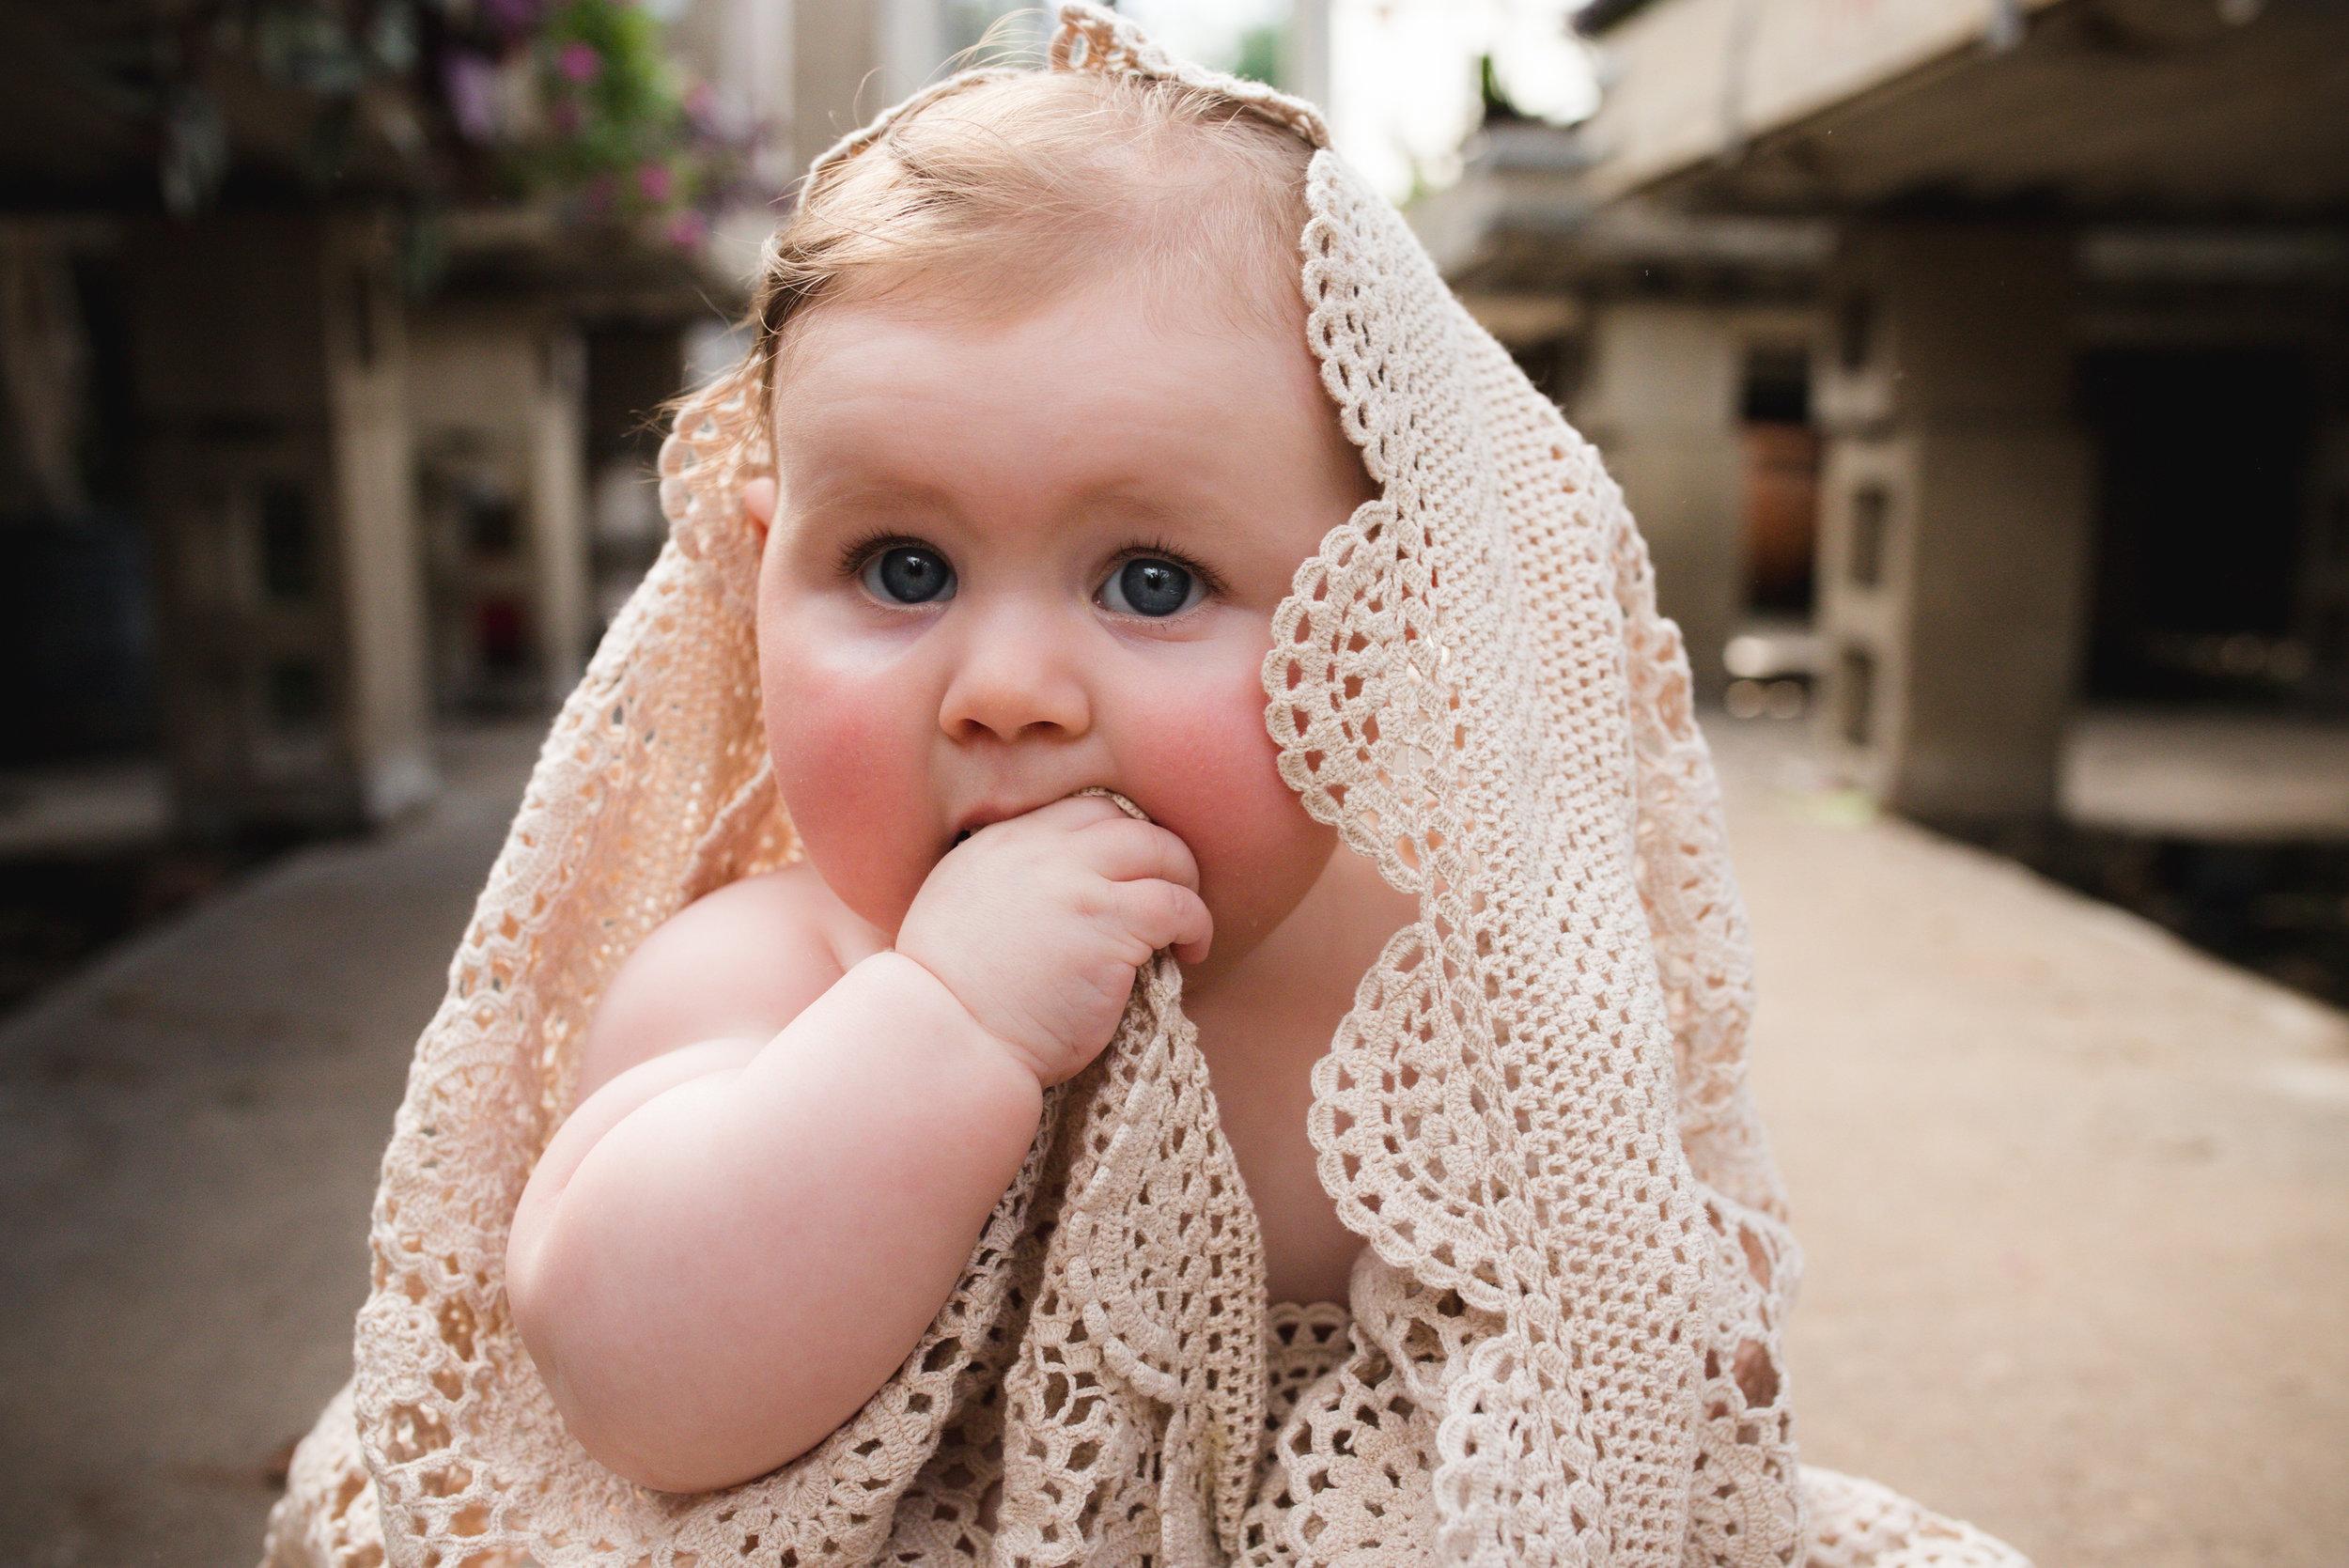 Doily blanket over baby girl in Iowa.